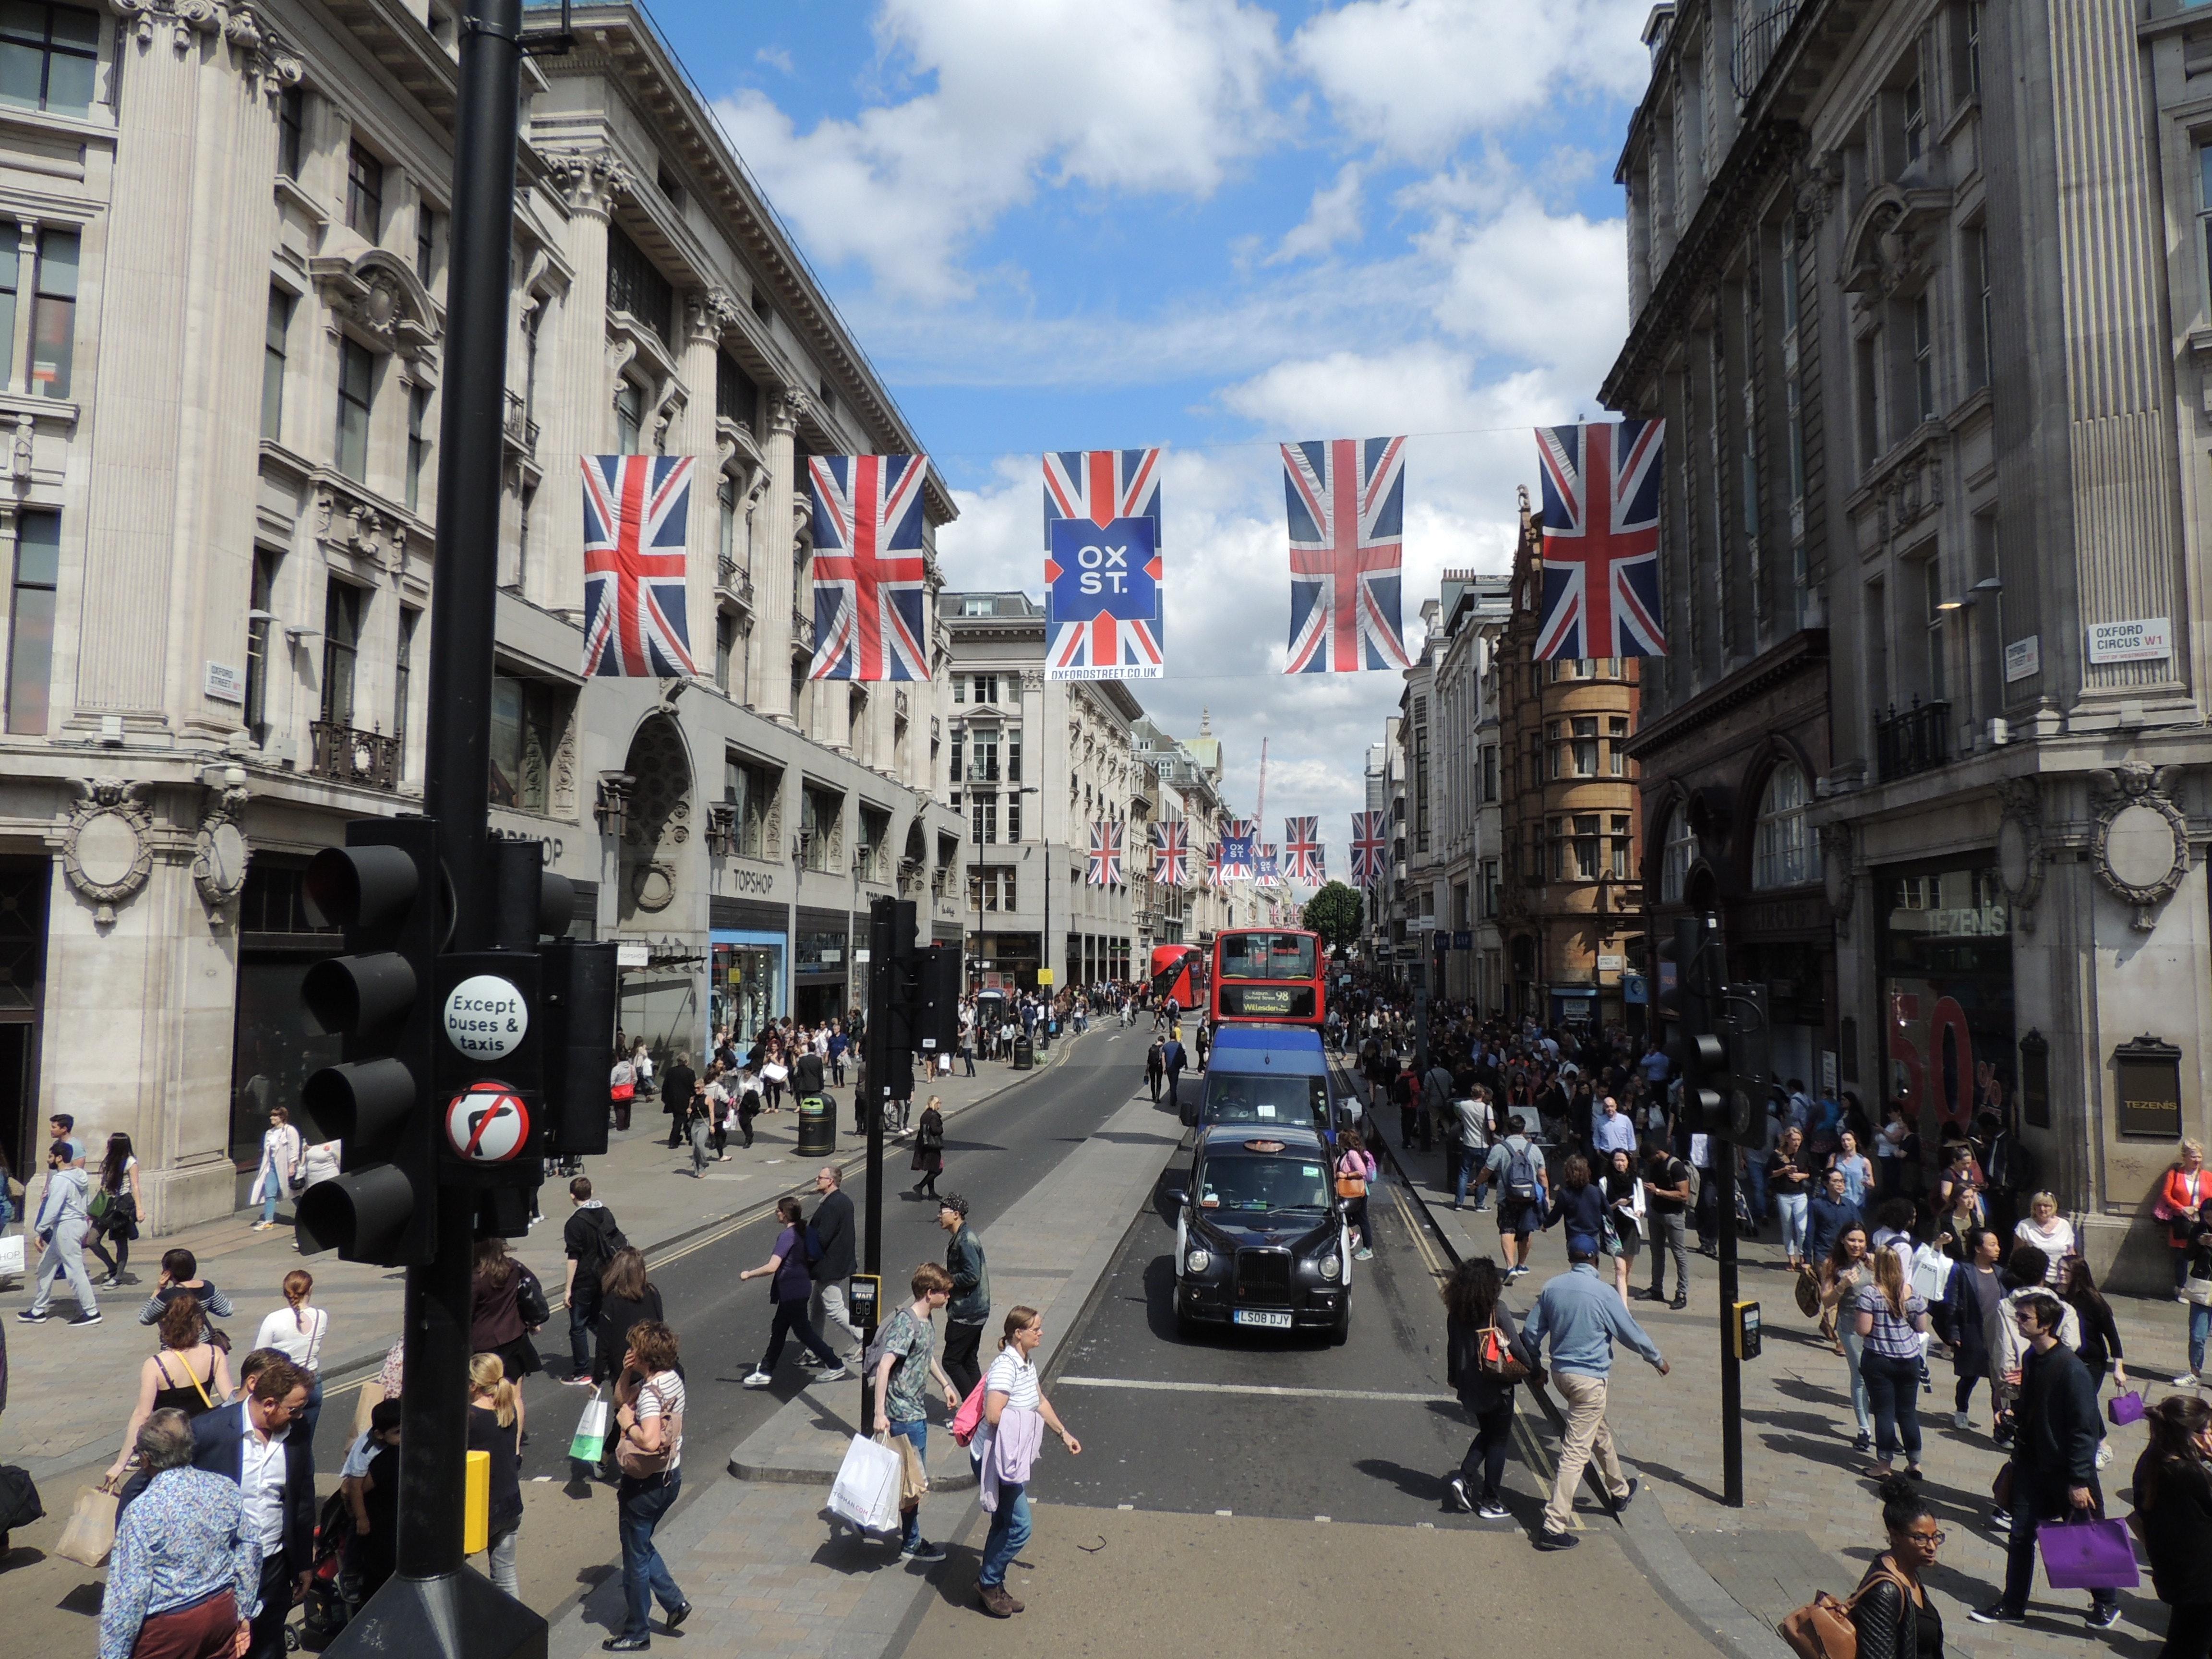 London city streets